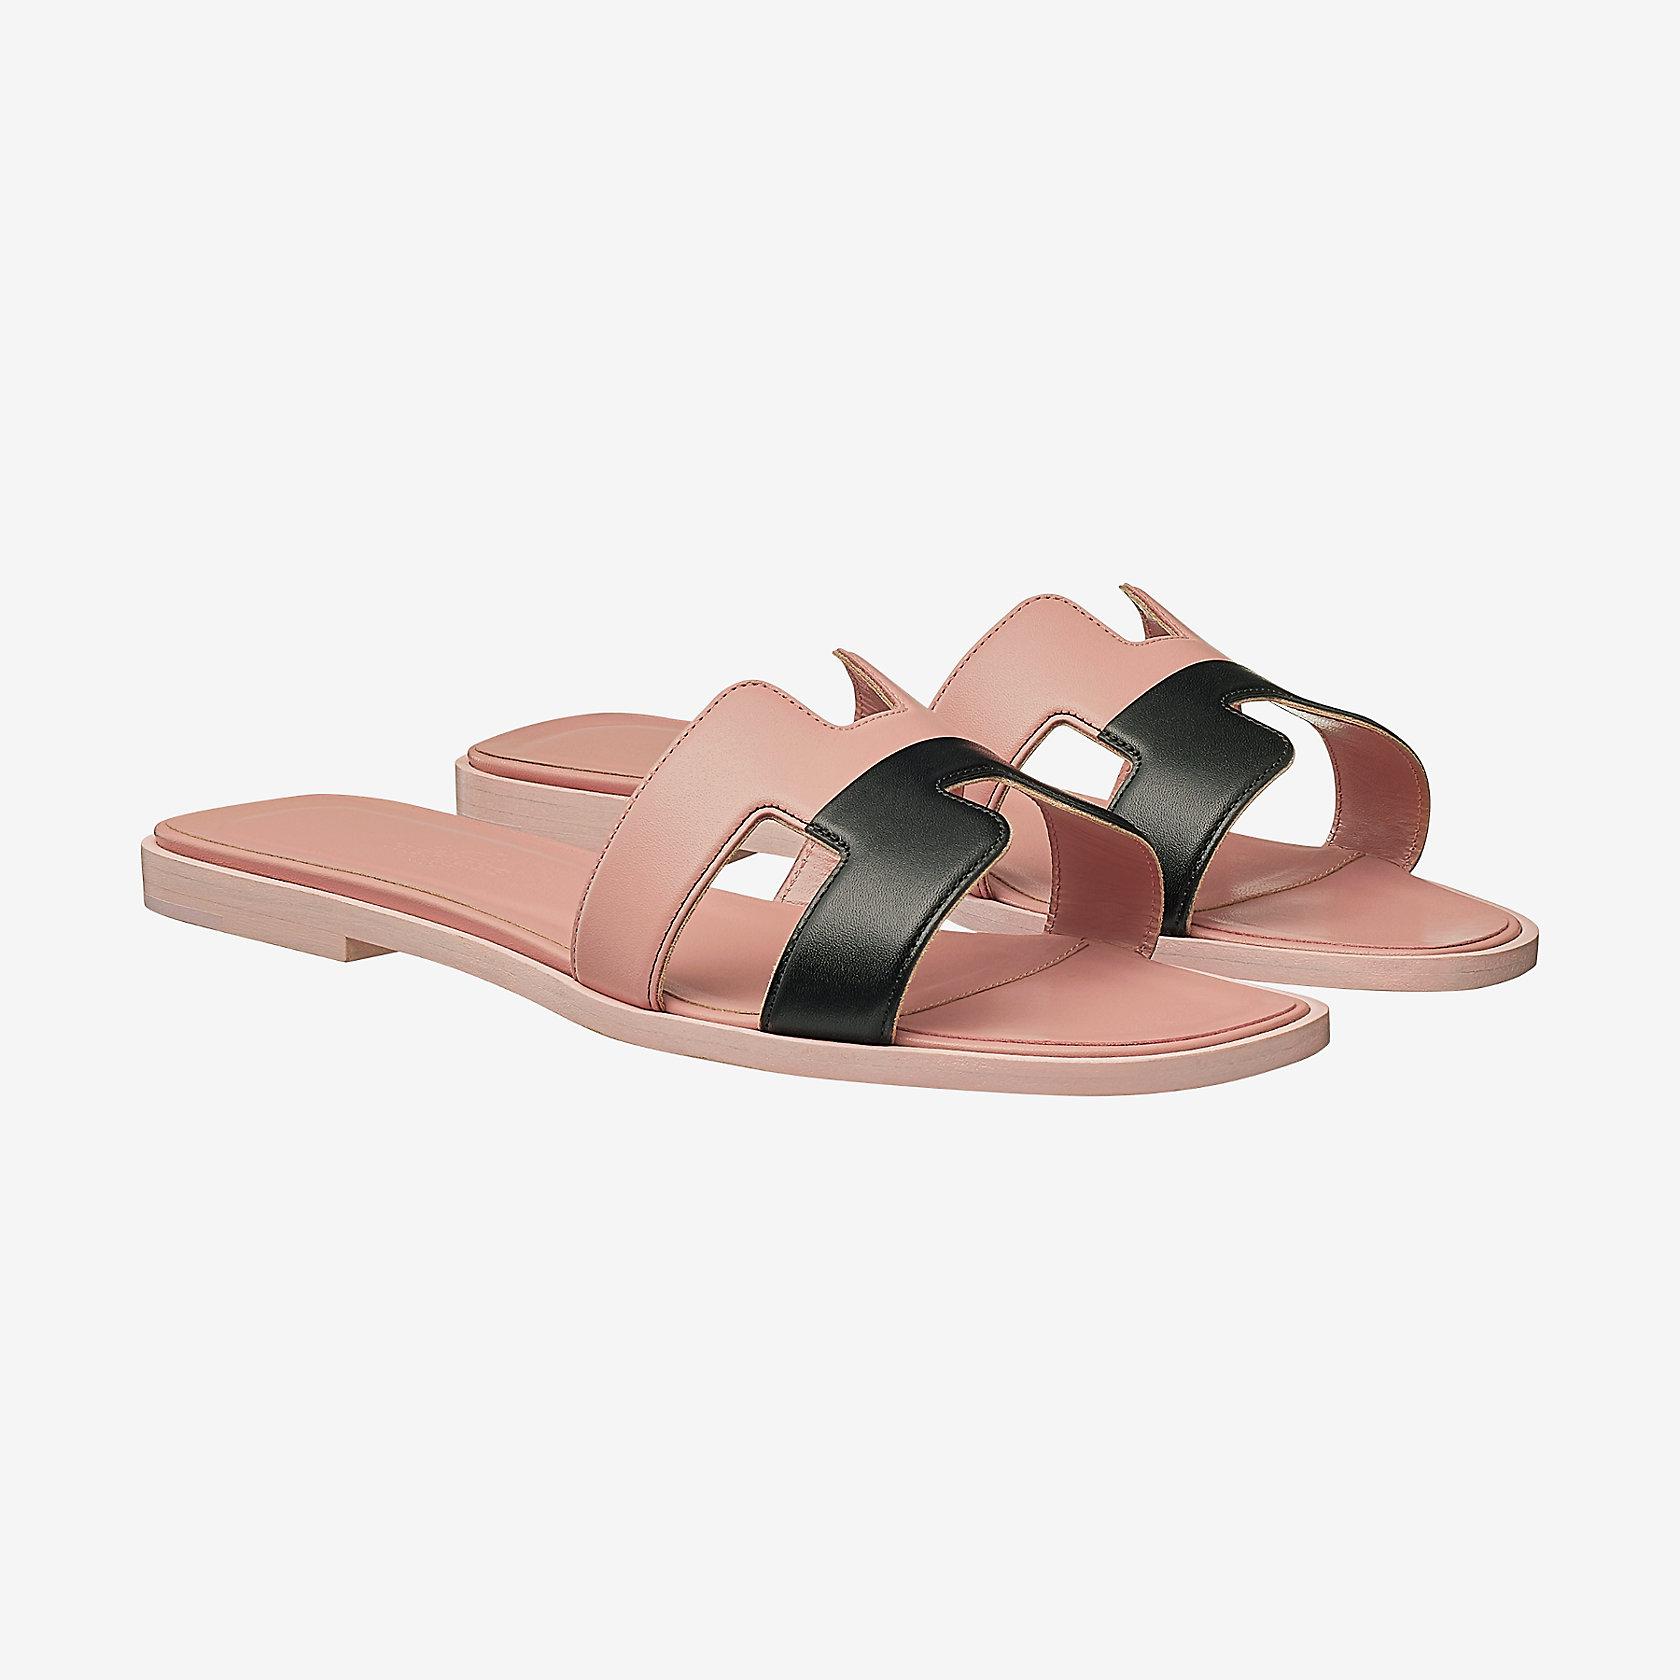 c4f3cced90c6 Oran sandal